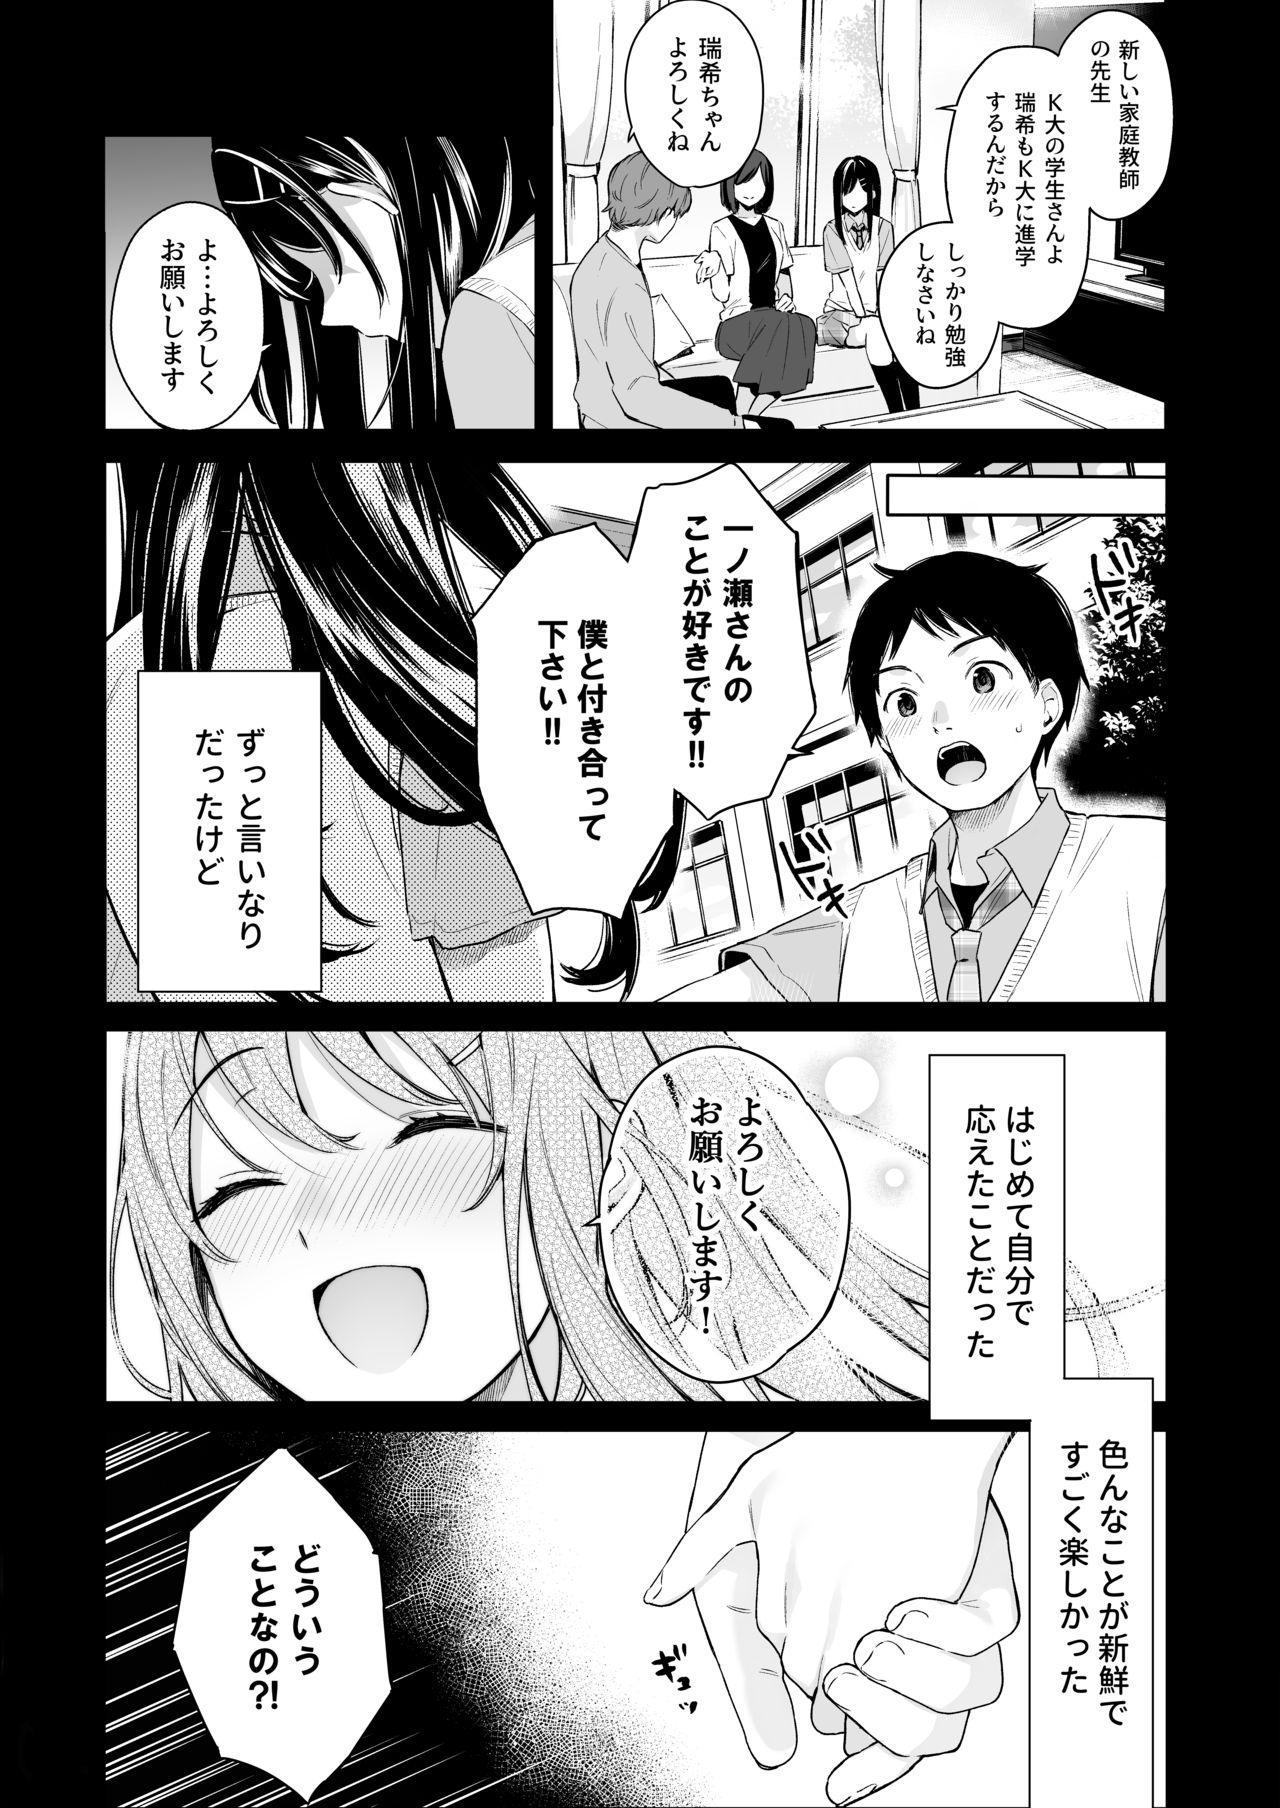 Itomusubi Vol. 4 4